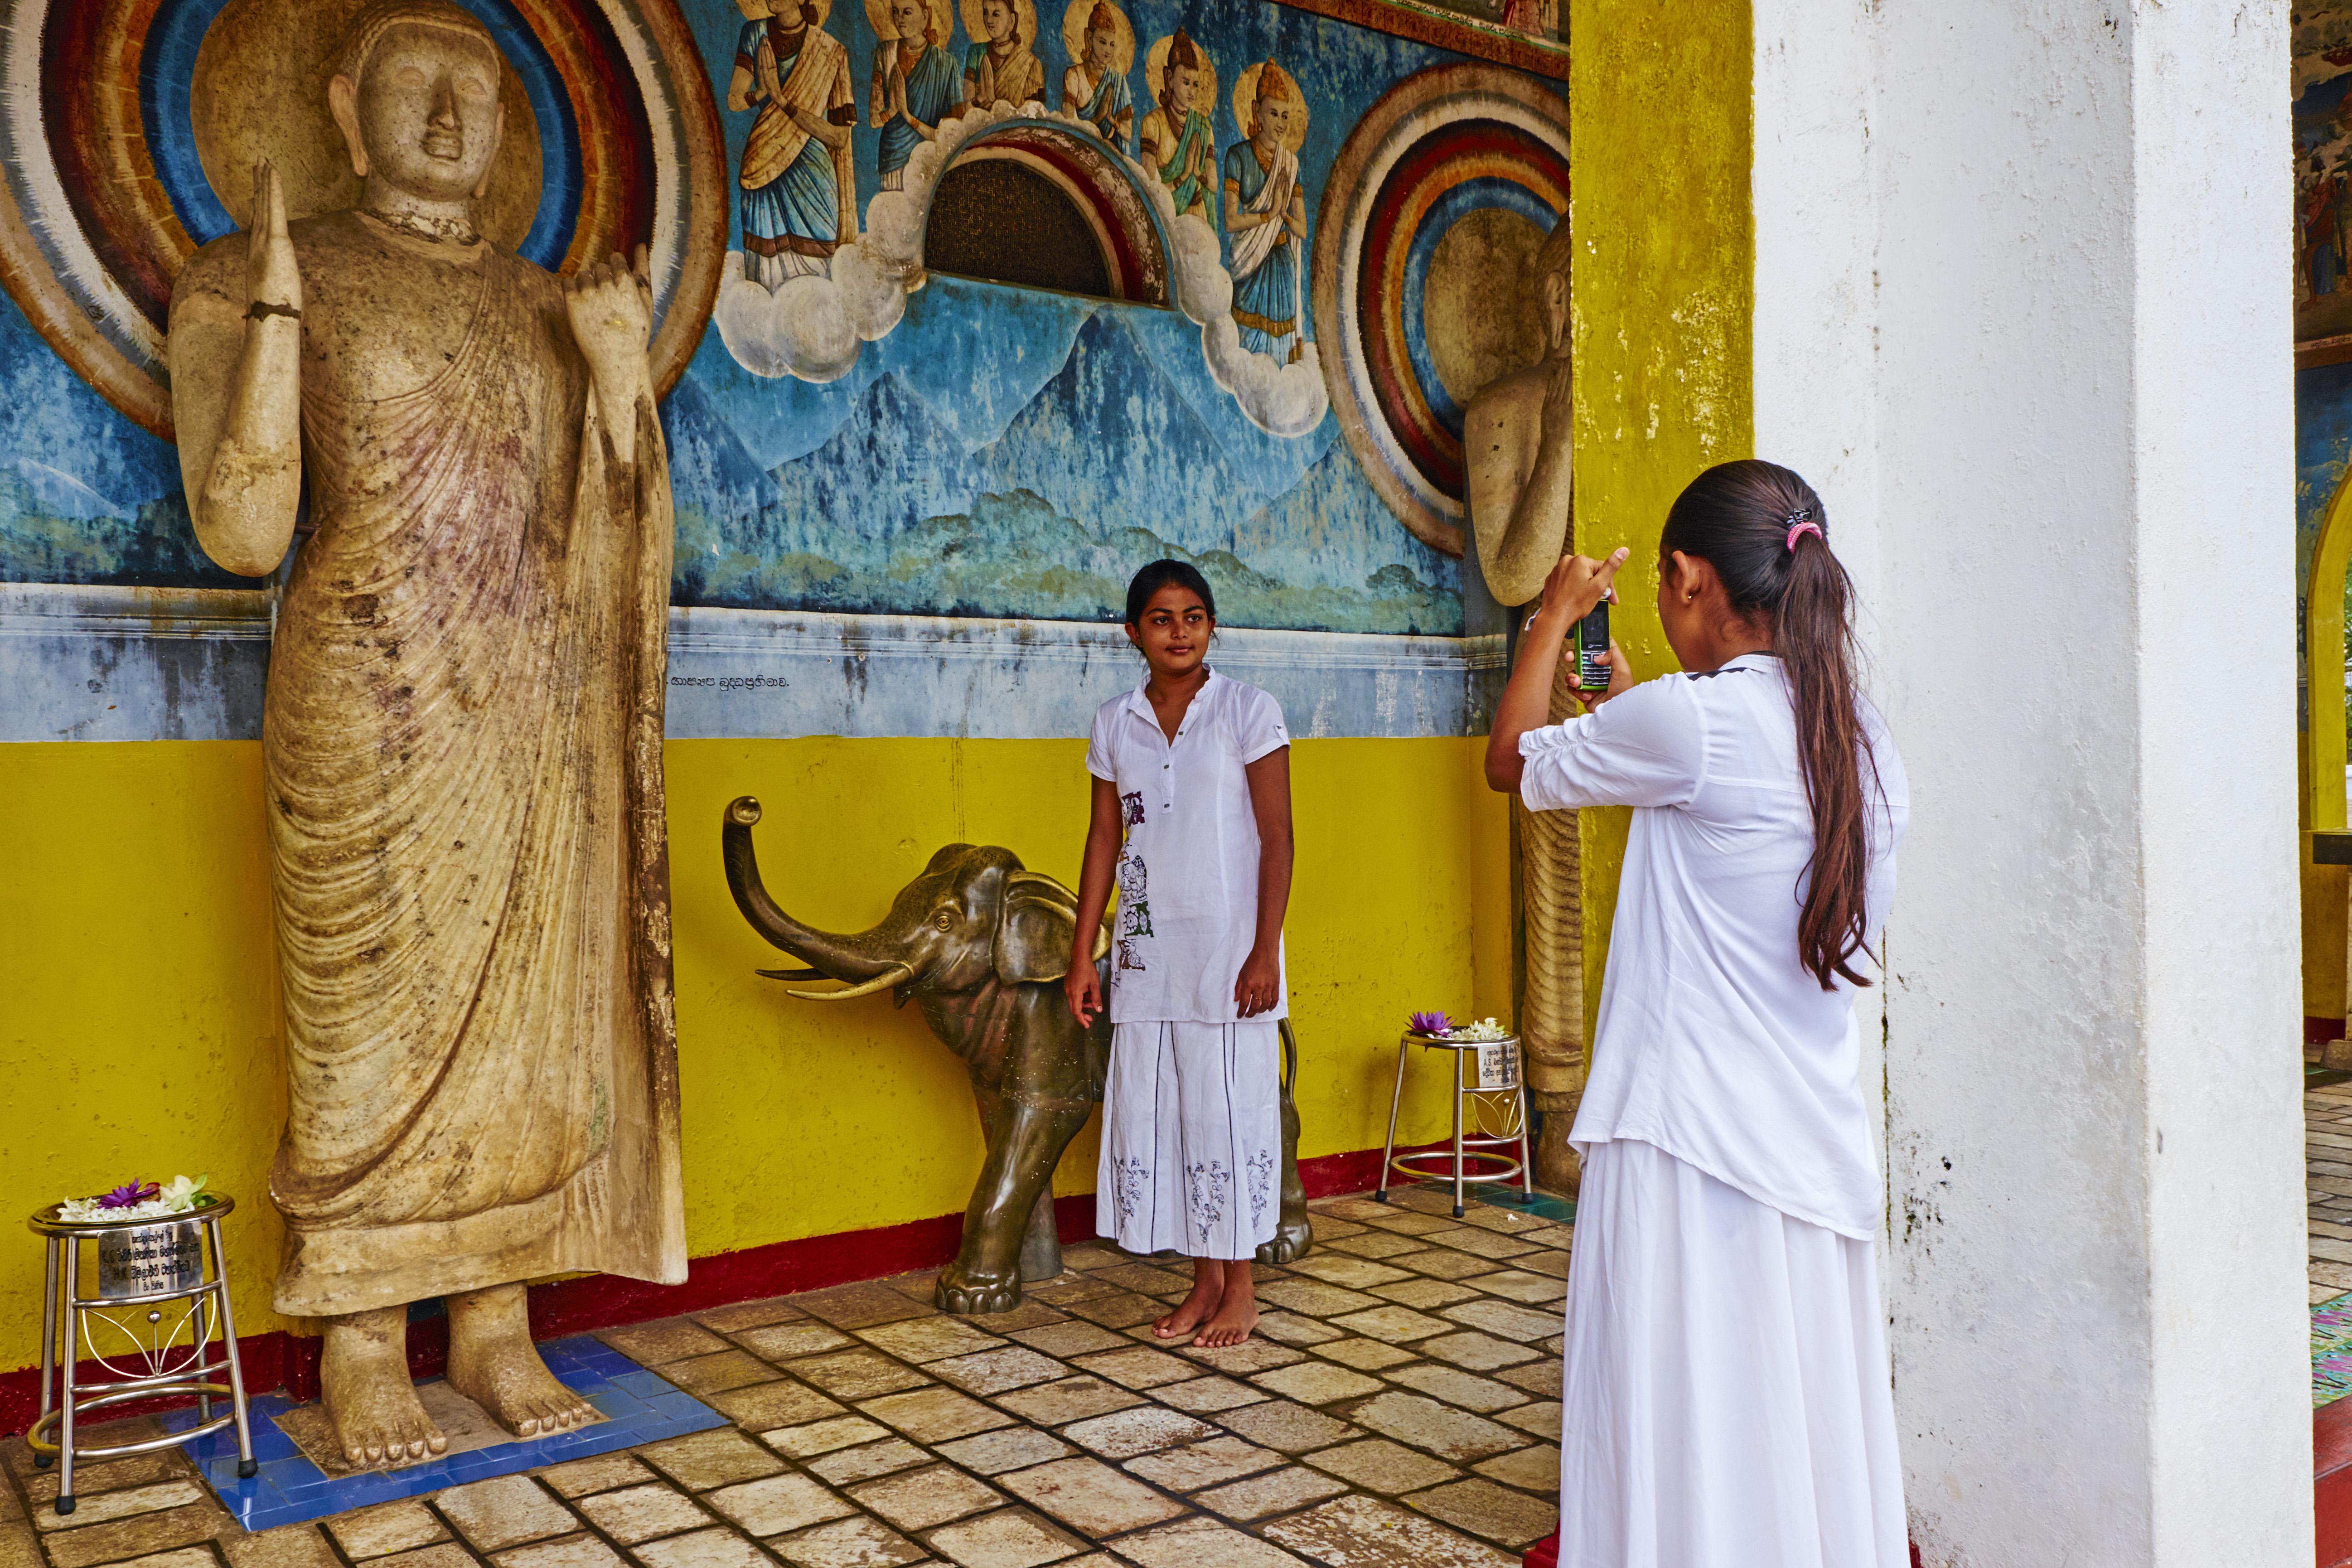 Sri Lanka, Anuradhapura, Ruvanvelisaya dagoba